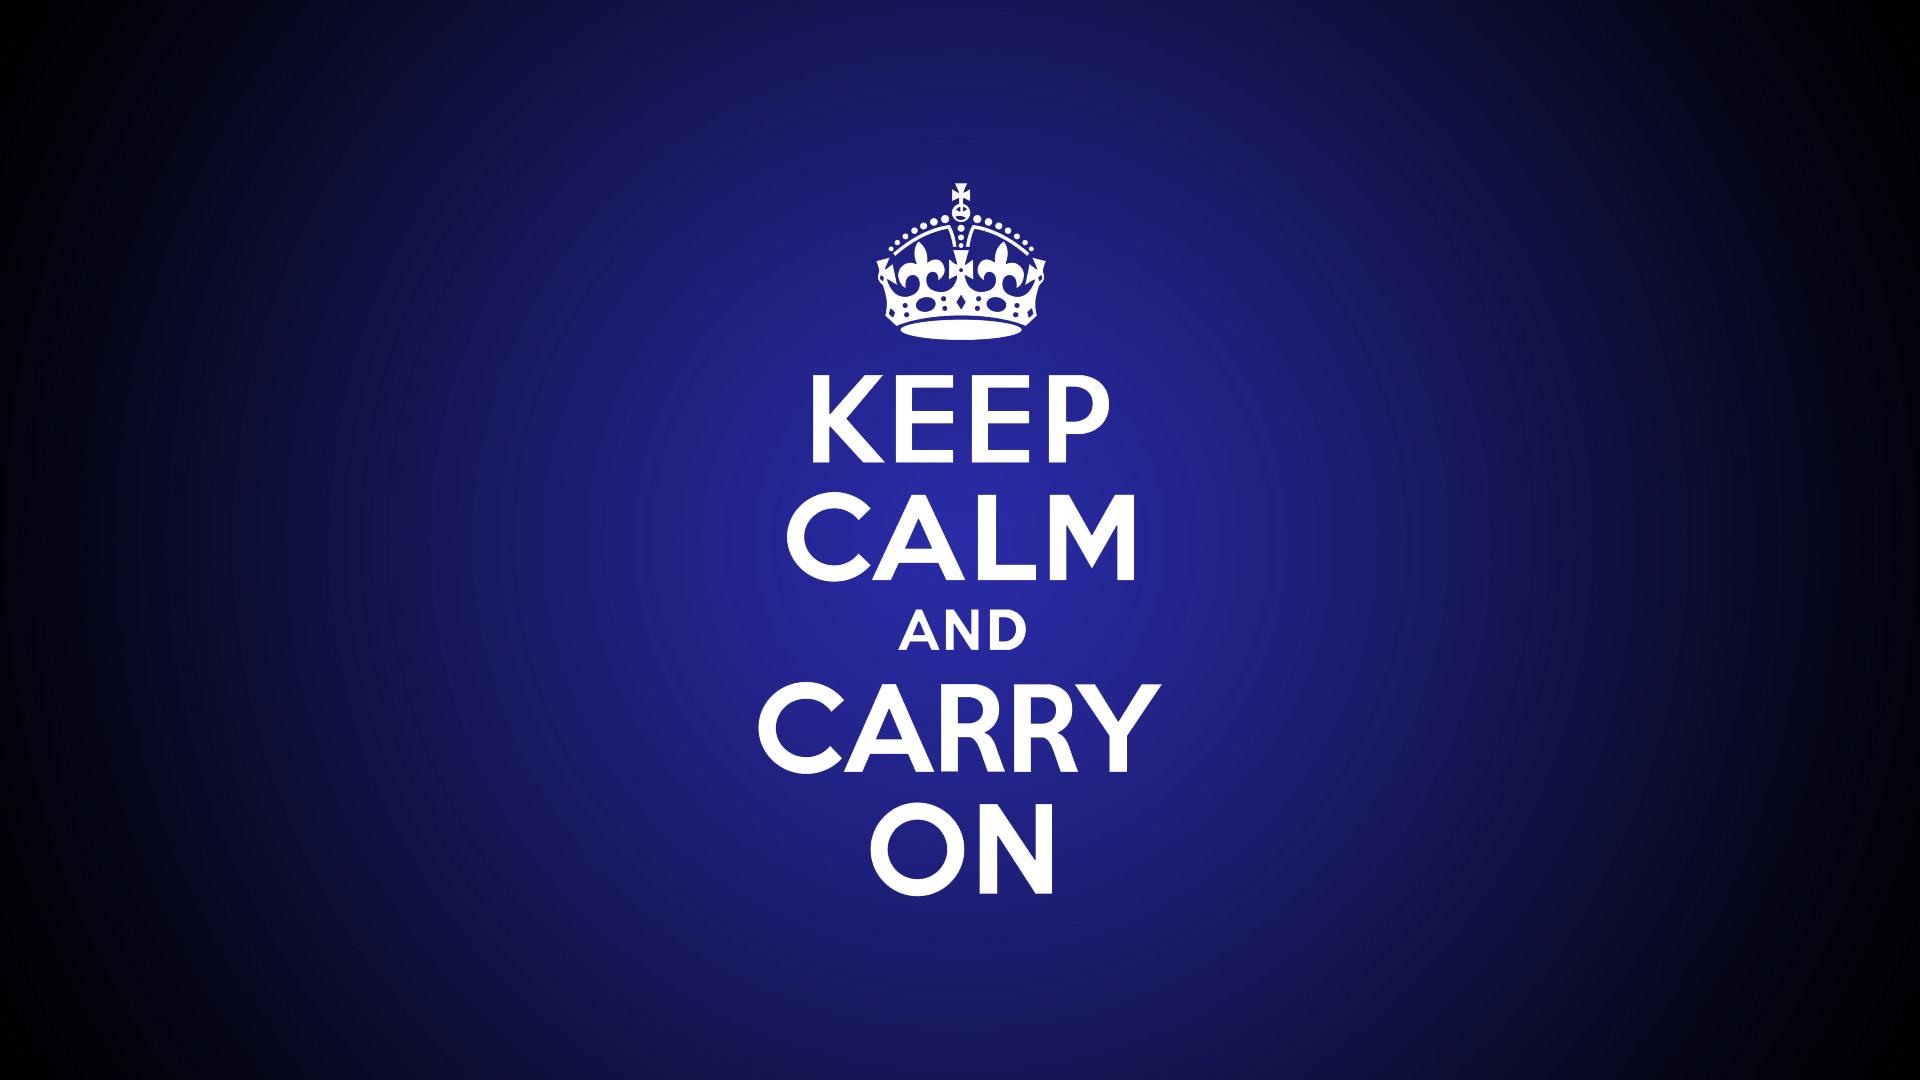 keep calm carry wallpaper download